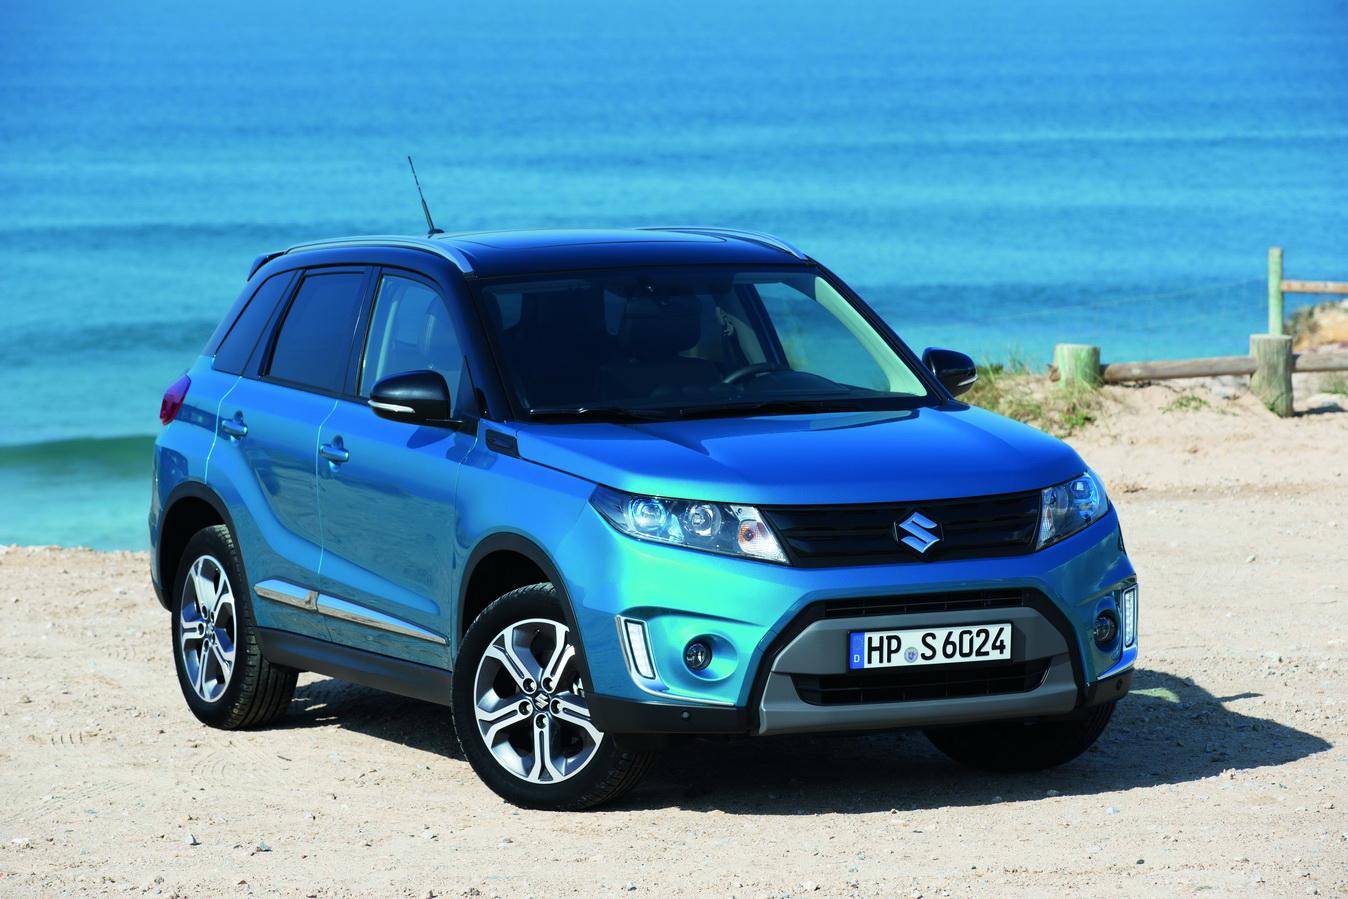 2015 Suzuki Vitara UK Price